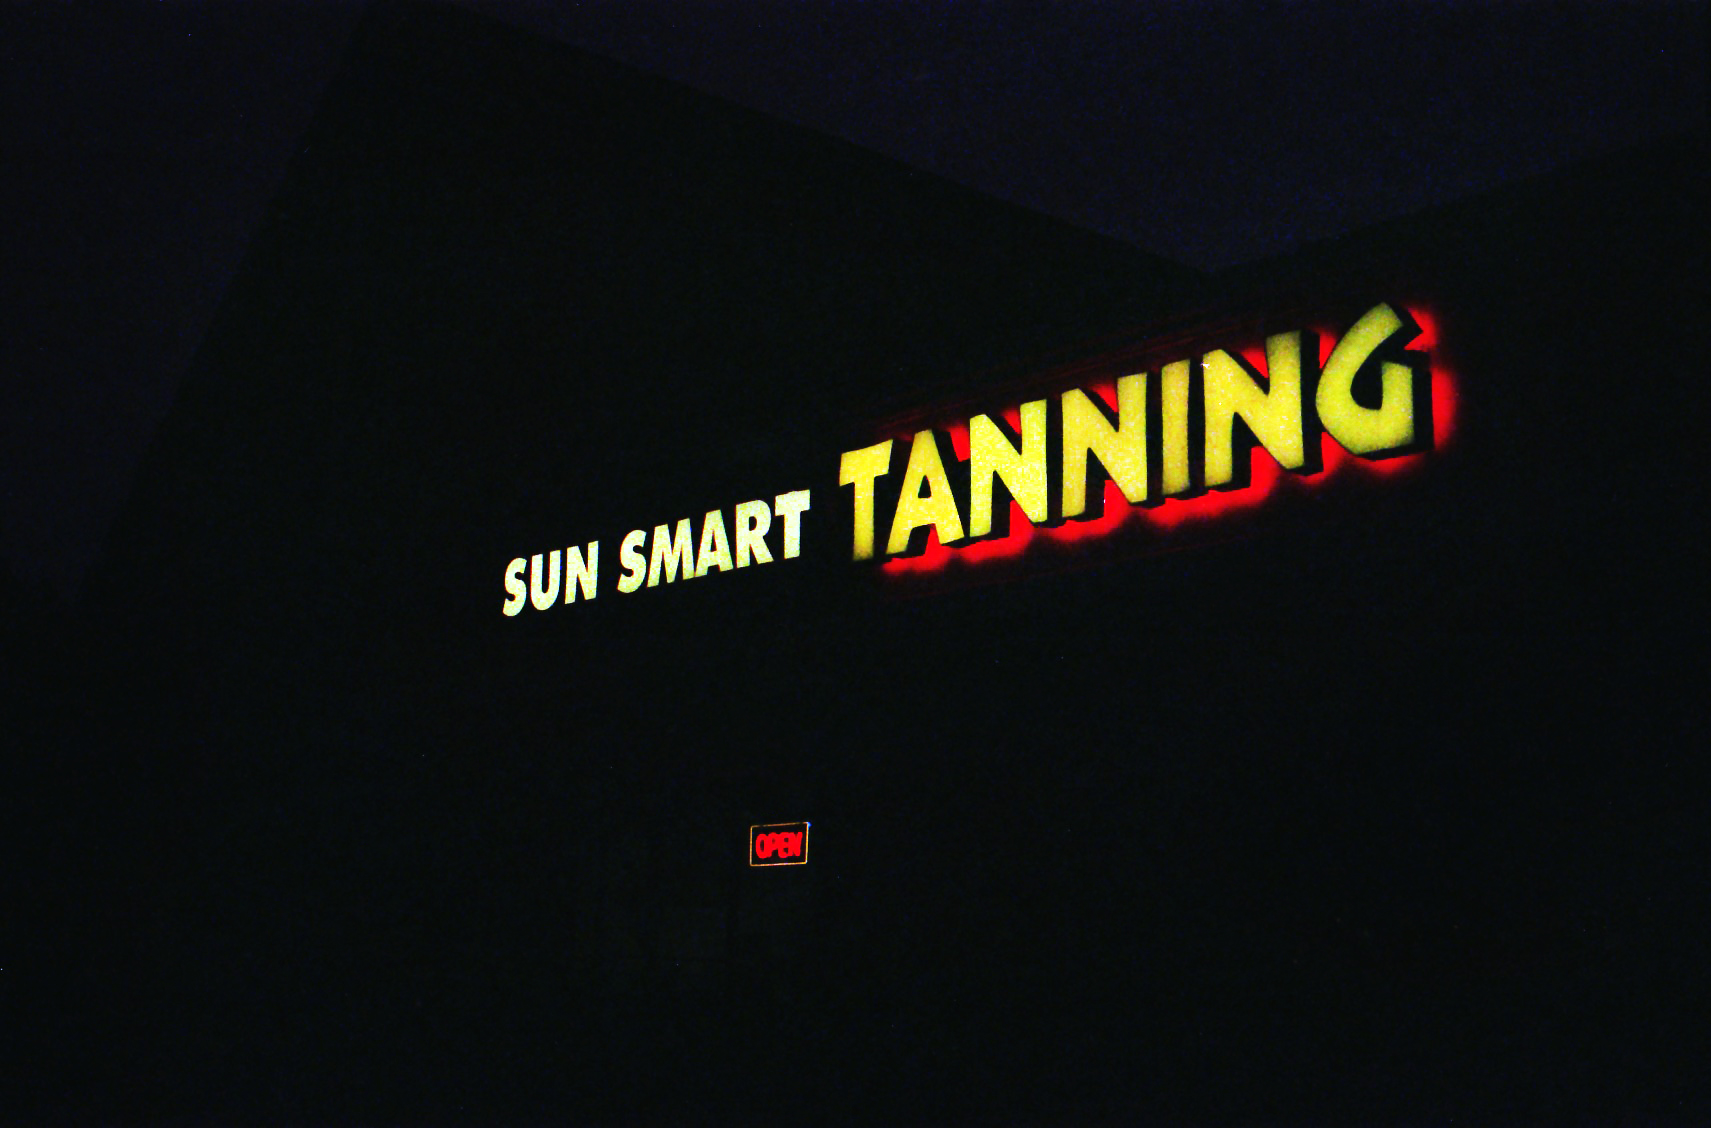 tanning.jpg